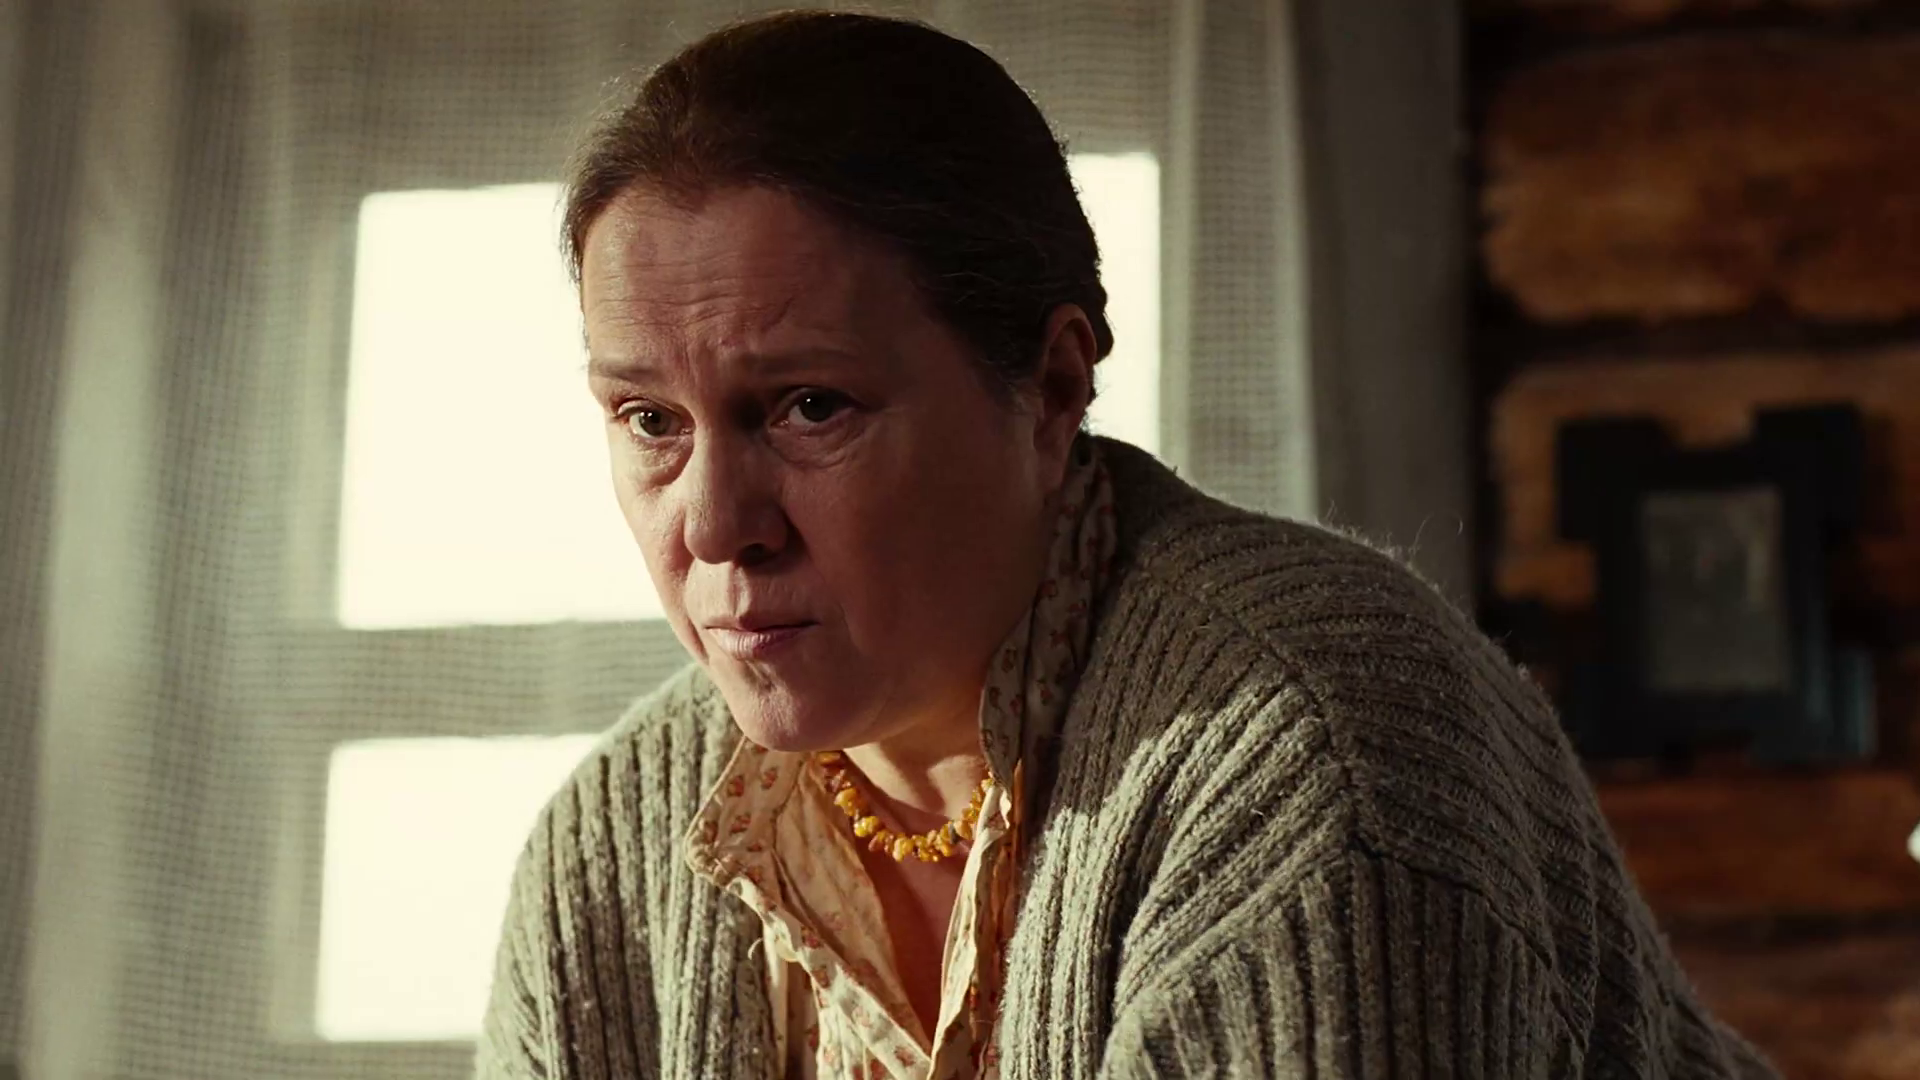 Nadezhda Markina dans le film Гагарин. Первый в космосе (2013) de Pavel Parkhomenko